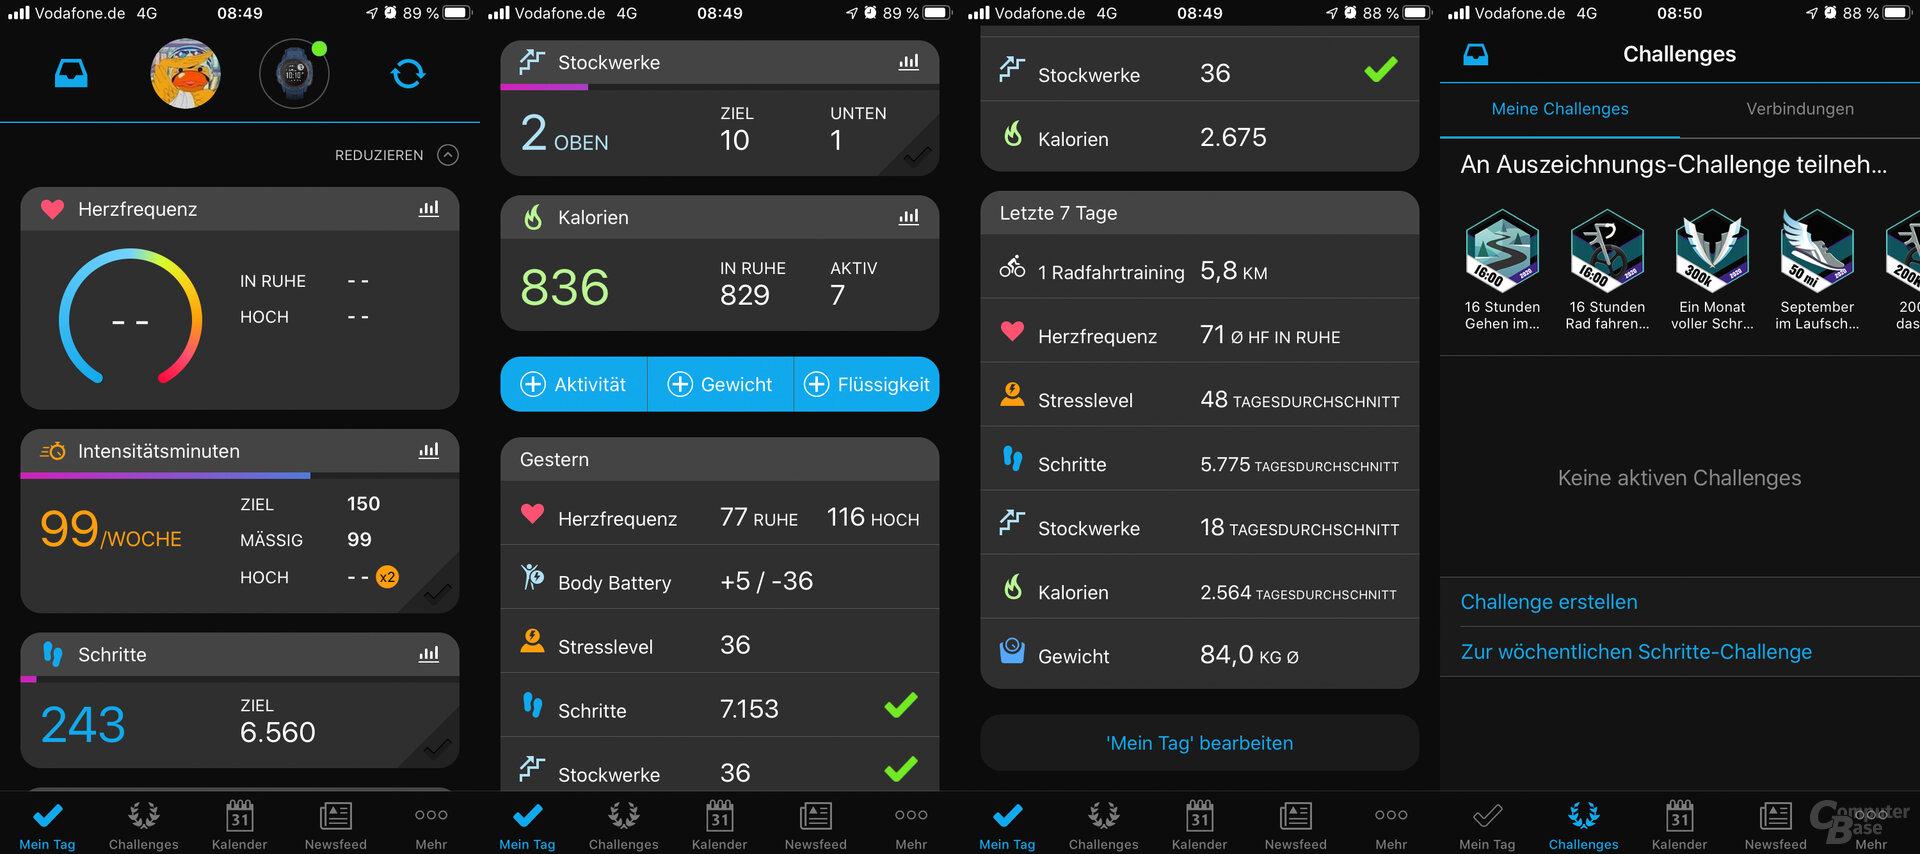 Garmin Connect: Aufbau der App